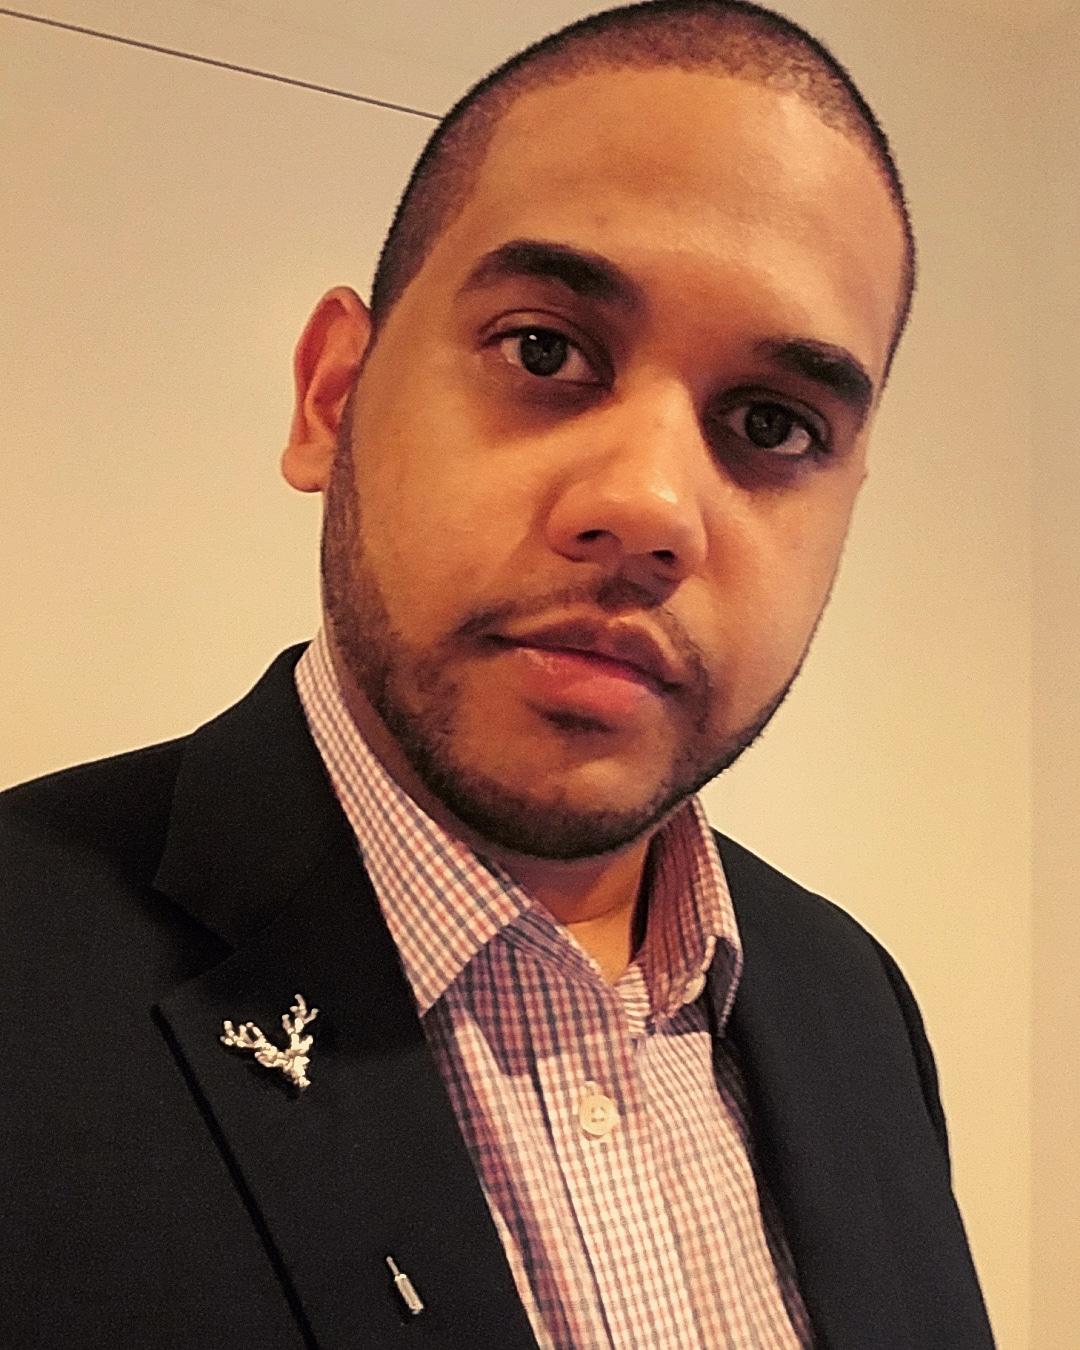 Daniel Fernandez - Business Actuary at The Navigators Group, Inc.